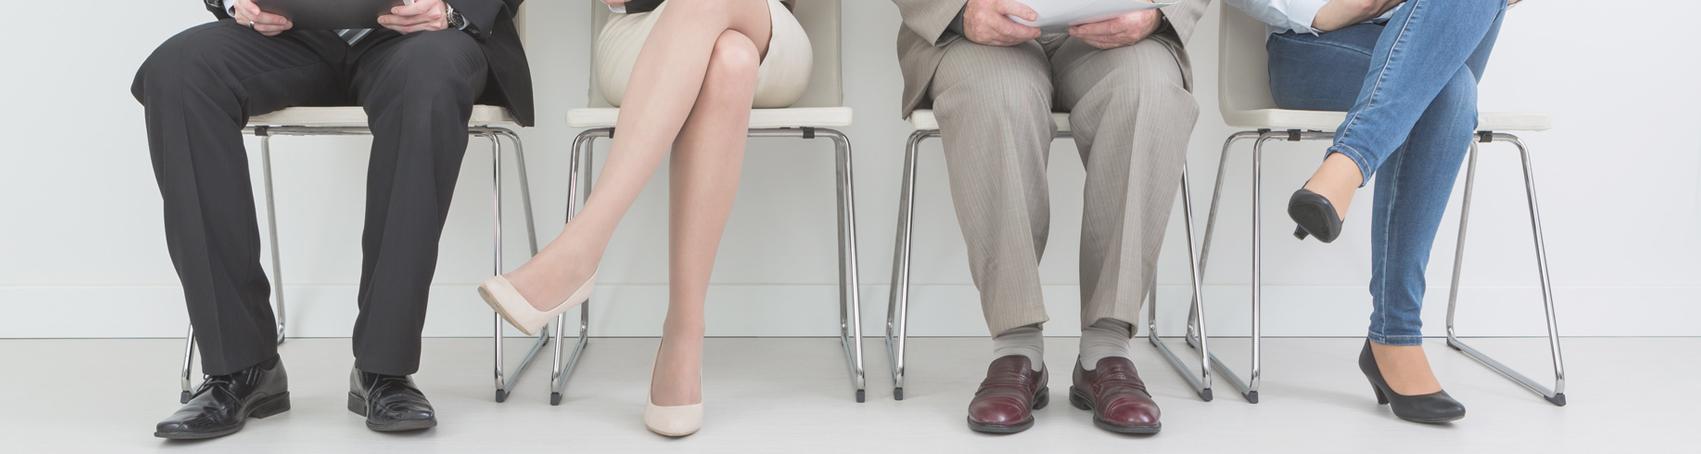 Aide recrutement comptable entreprise - Fidaquitaine